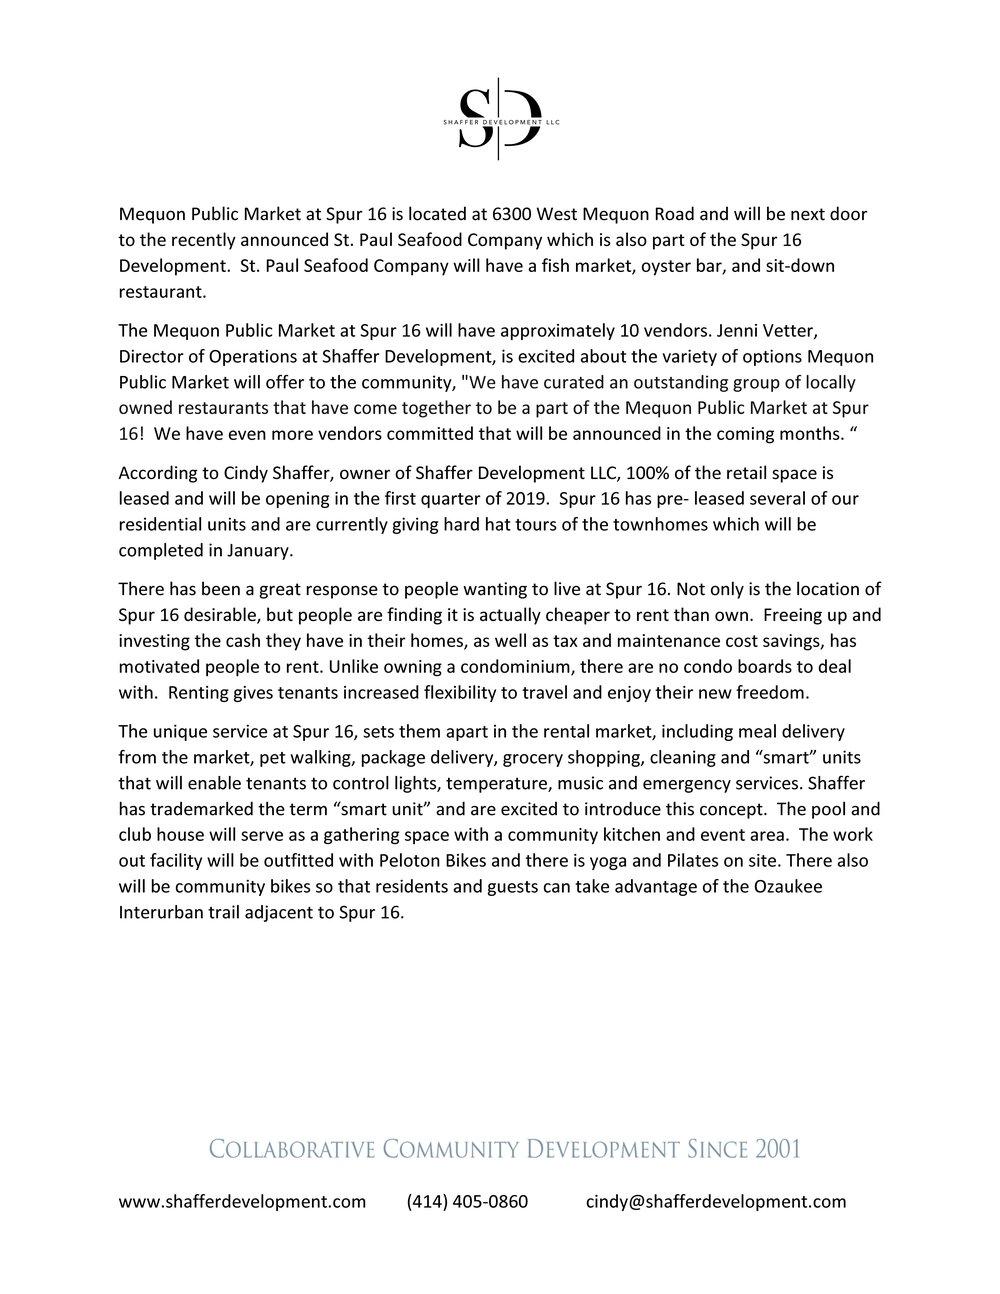 Screaming Tuna Press Release_Page_2.jpg